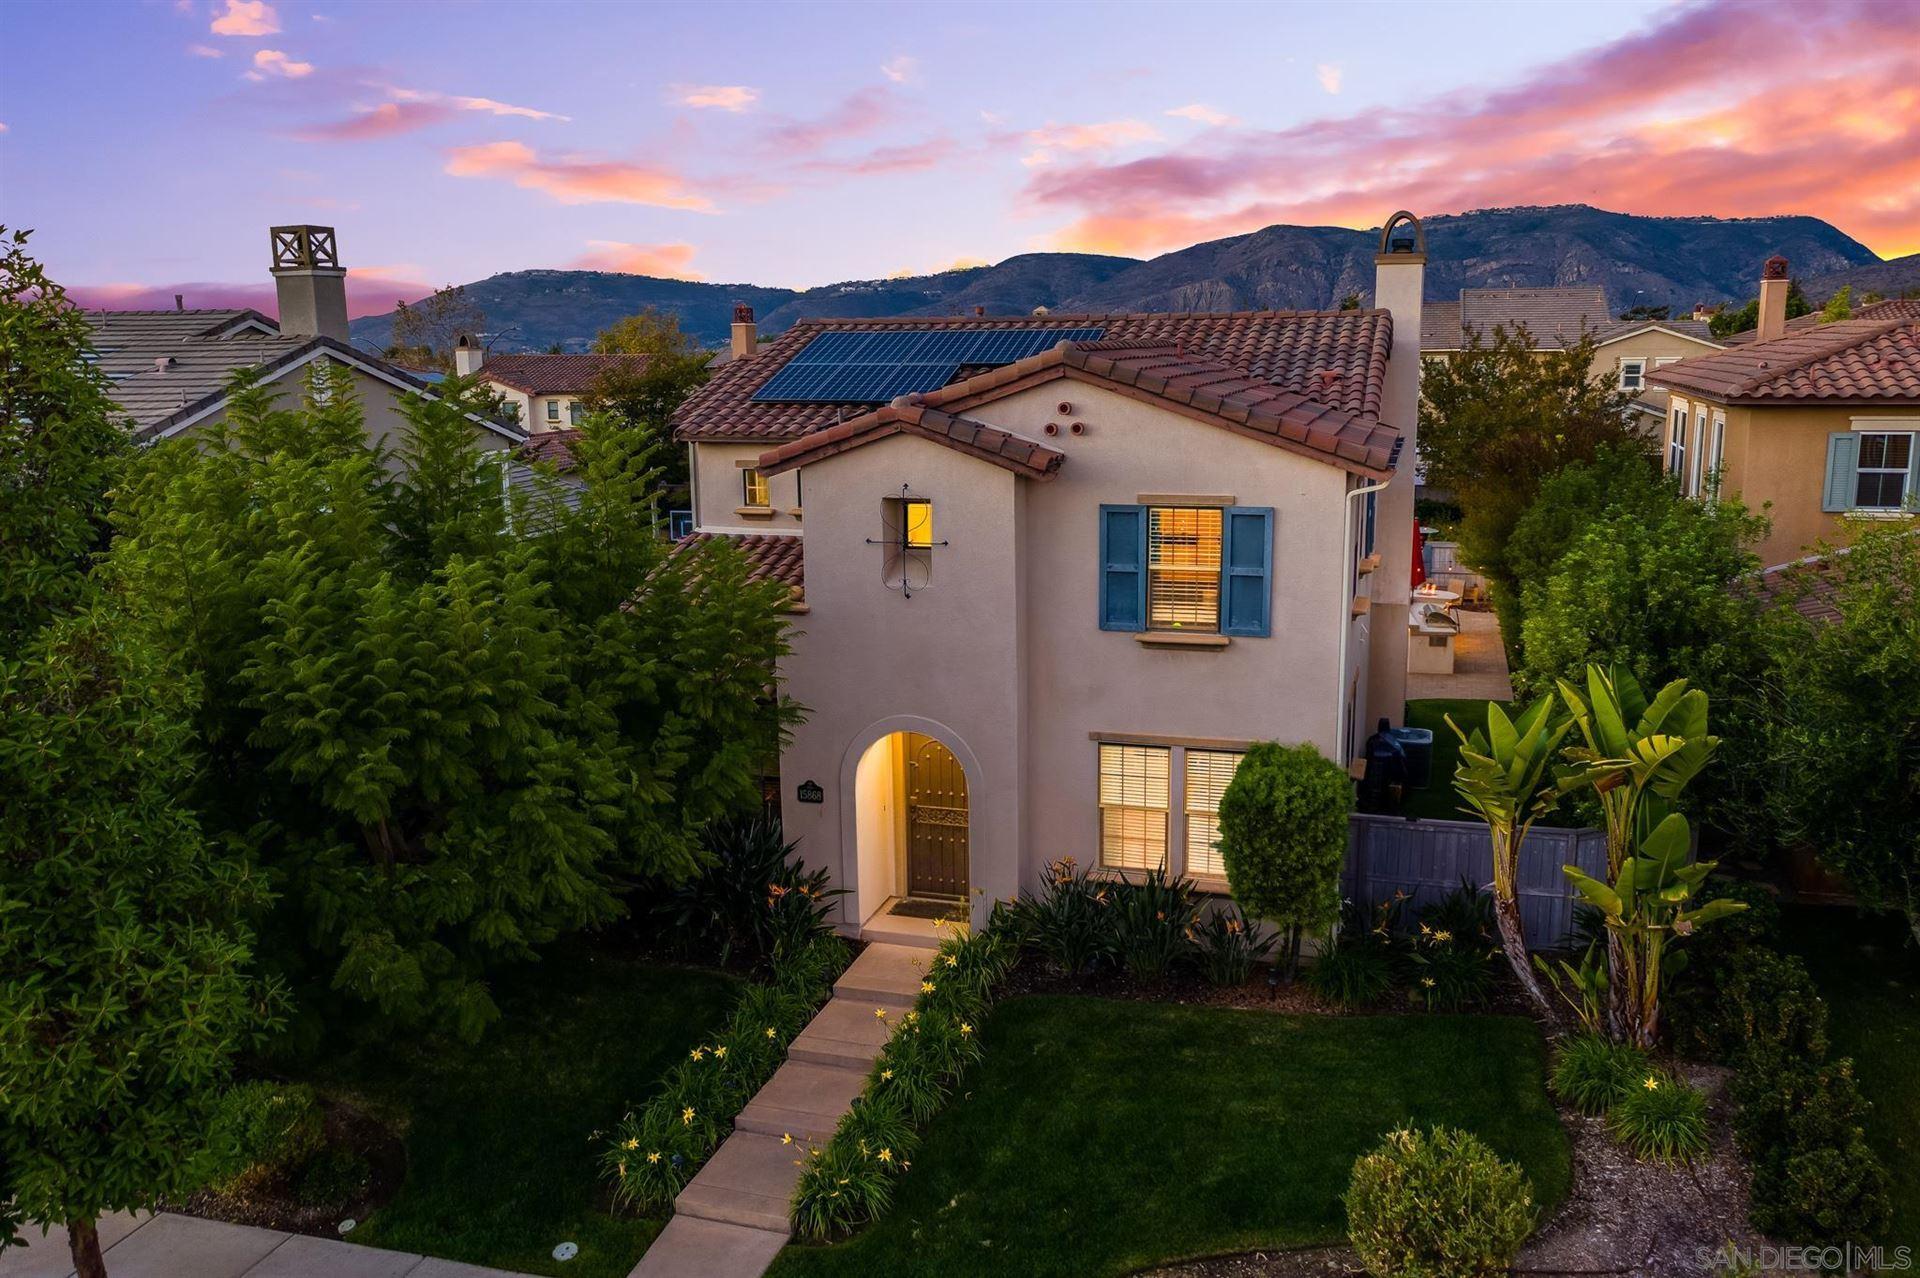 Photo of 15868 Monte Alto Ter, San Diego, CA 92127 (MLS # 210029345)